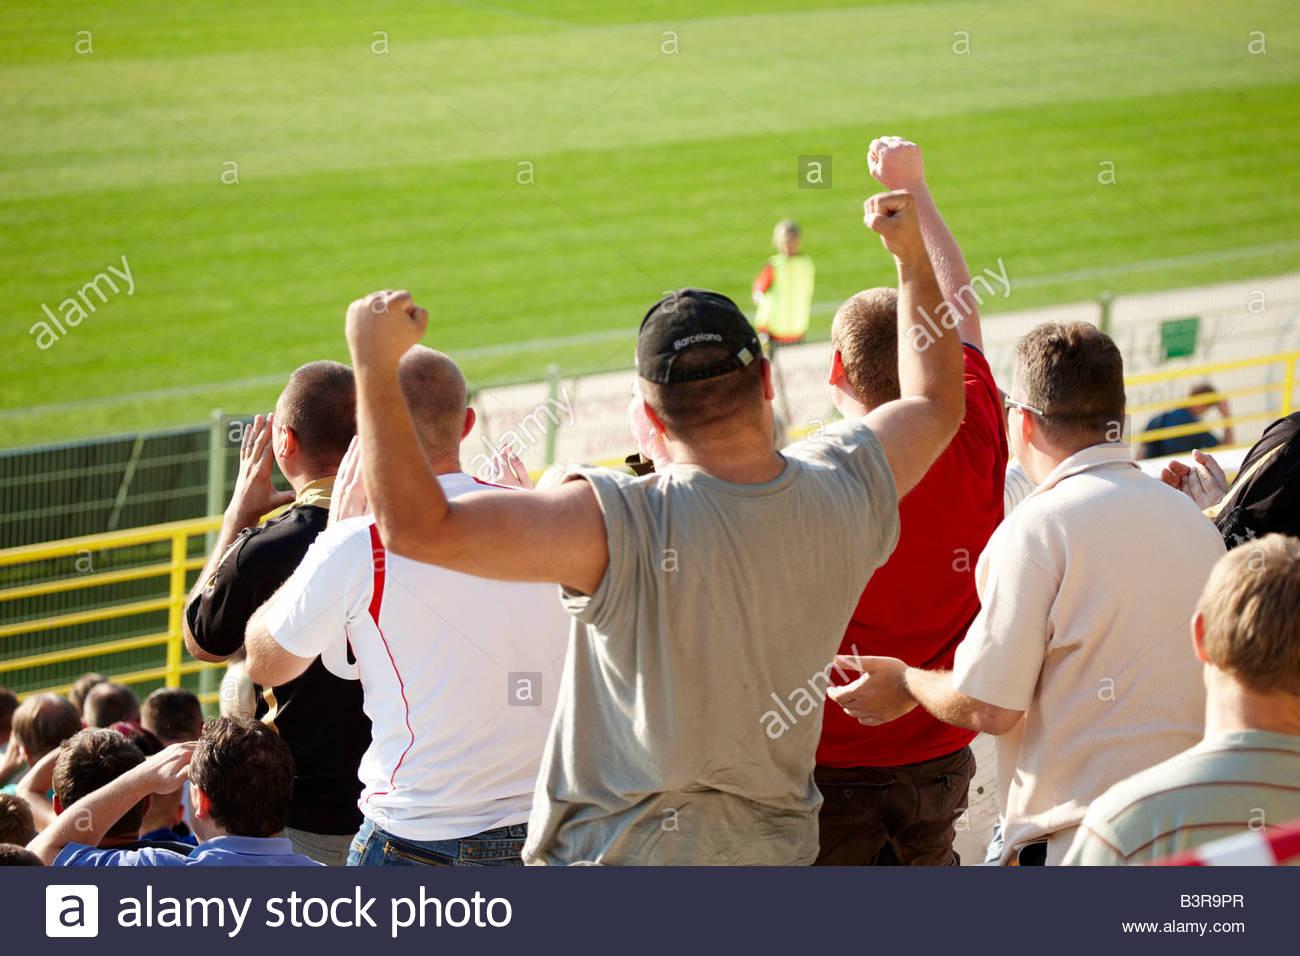 Audience - Stock Image